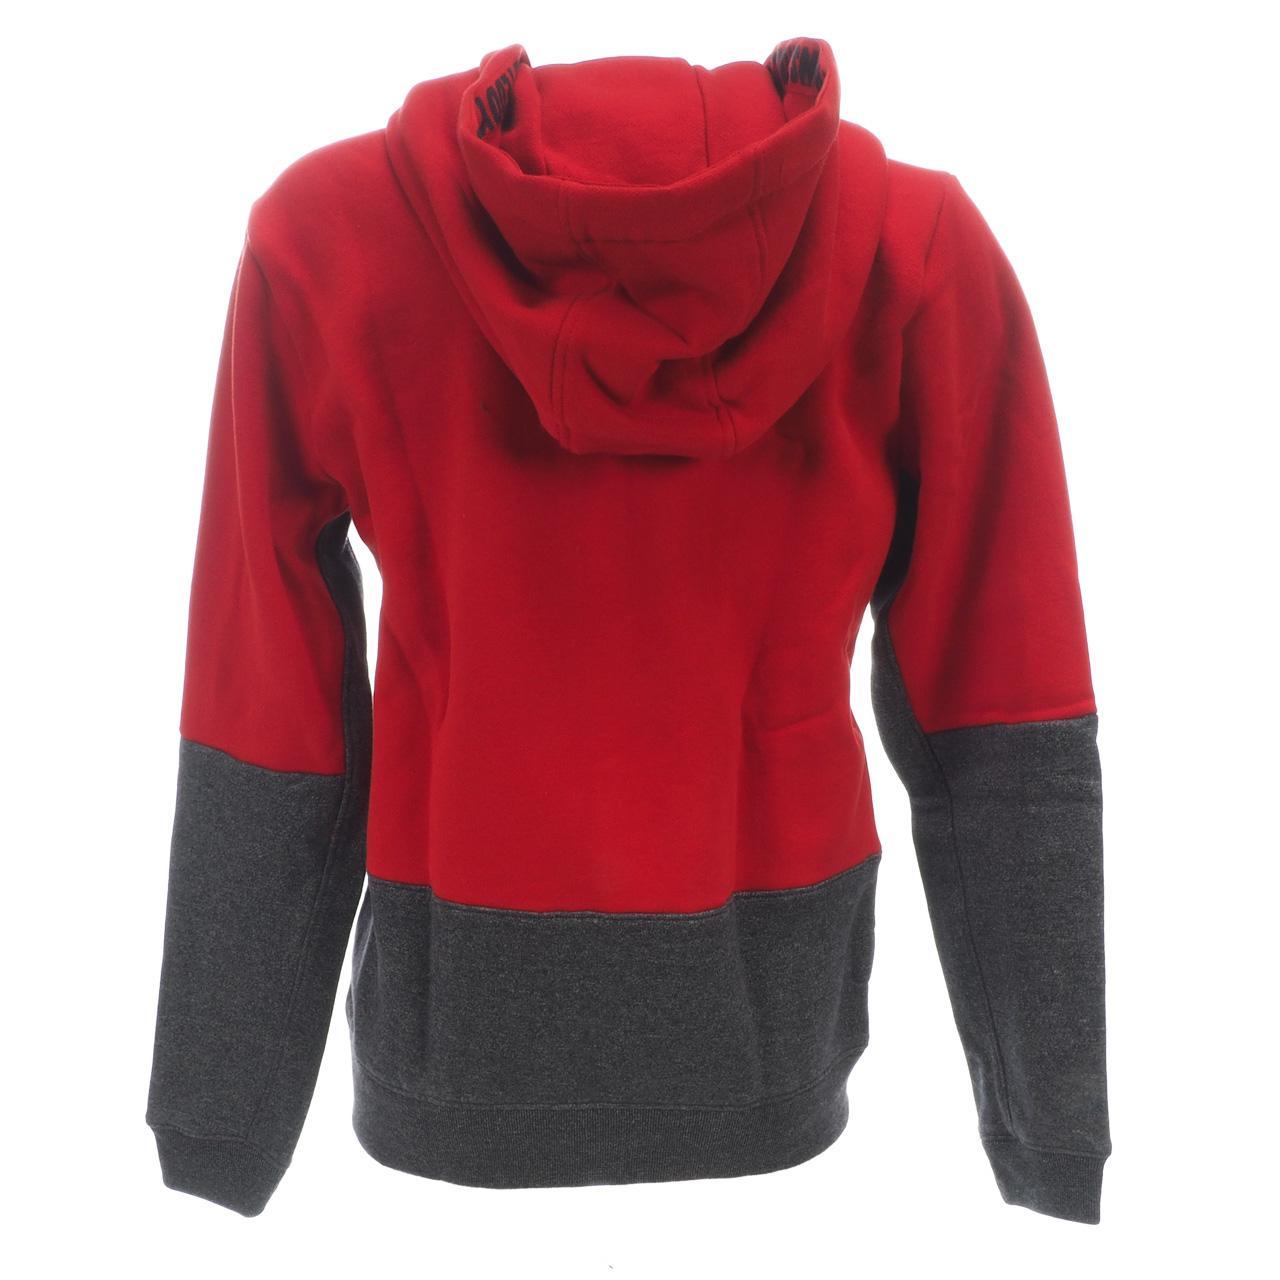 Jacken-Sweatshirts-Zipped-Kapuze-Teddy-Smith-Gafe-Blood-Fz-Umhang-Sw-Jr-Rot